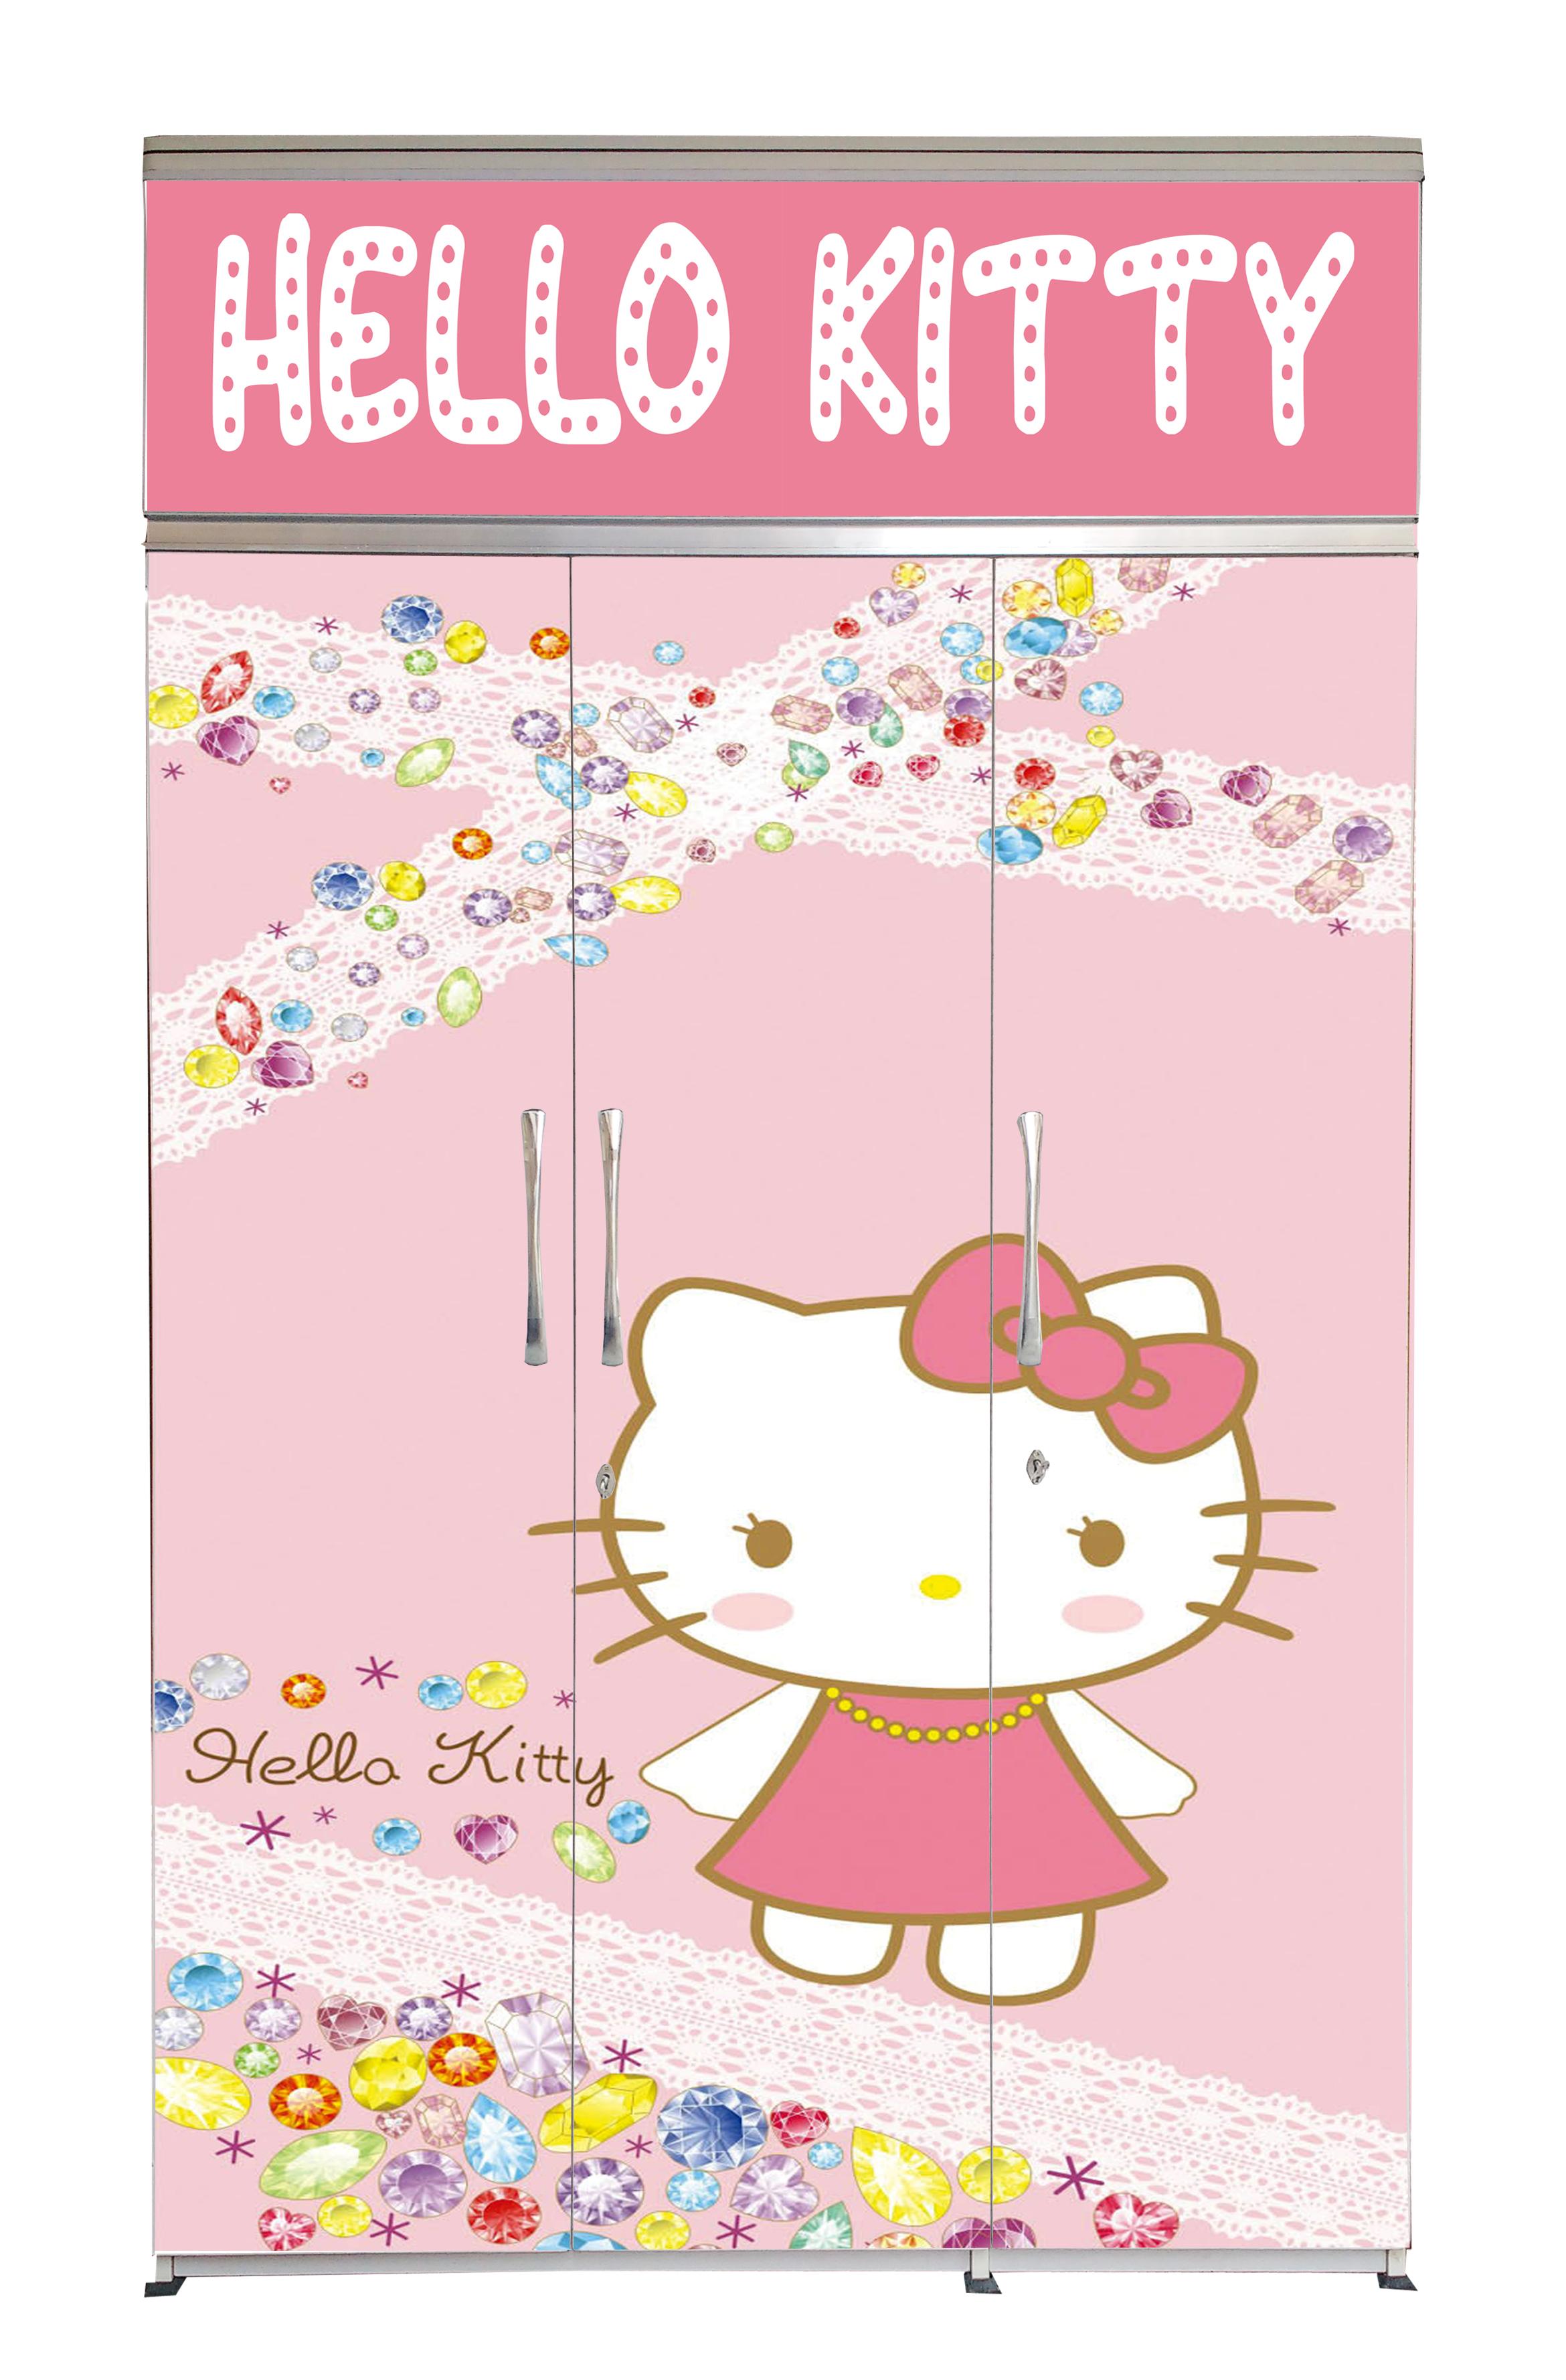 3D-Hello Kitty-1-Front